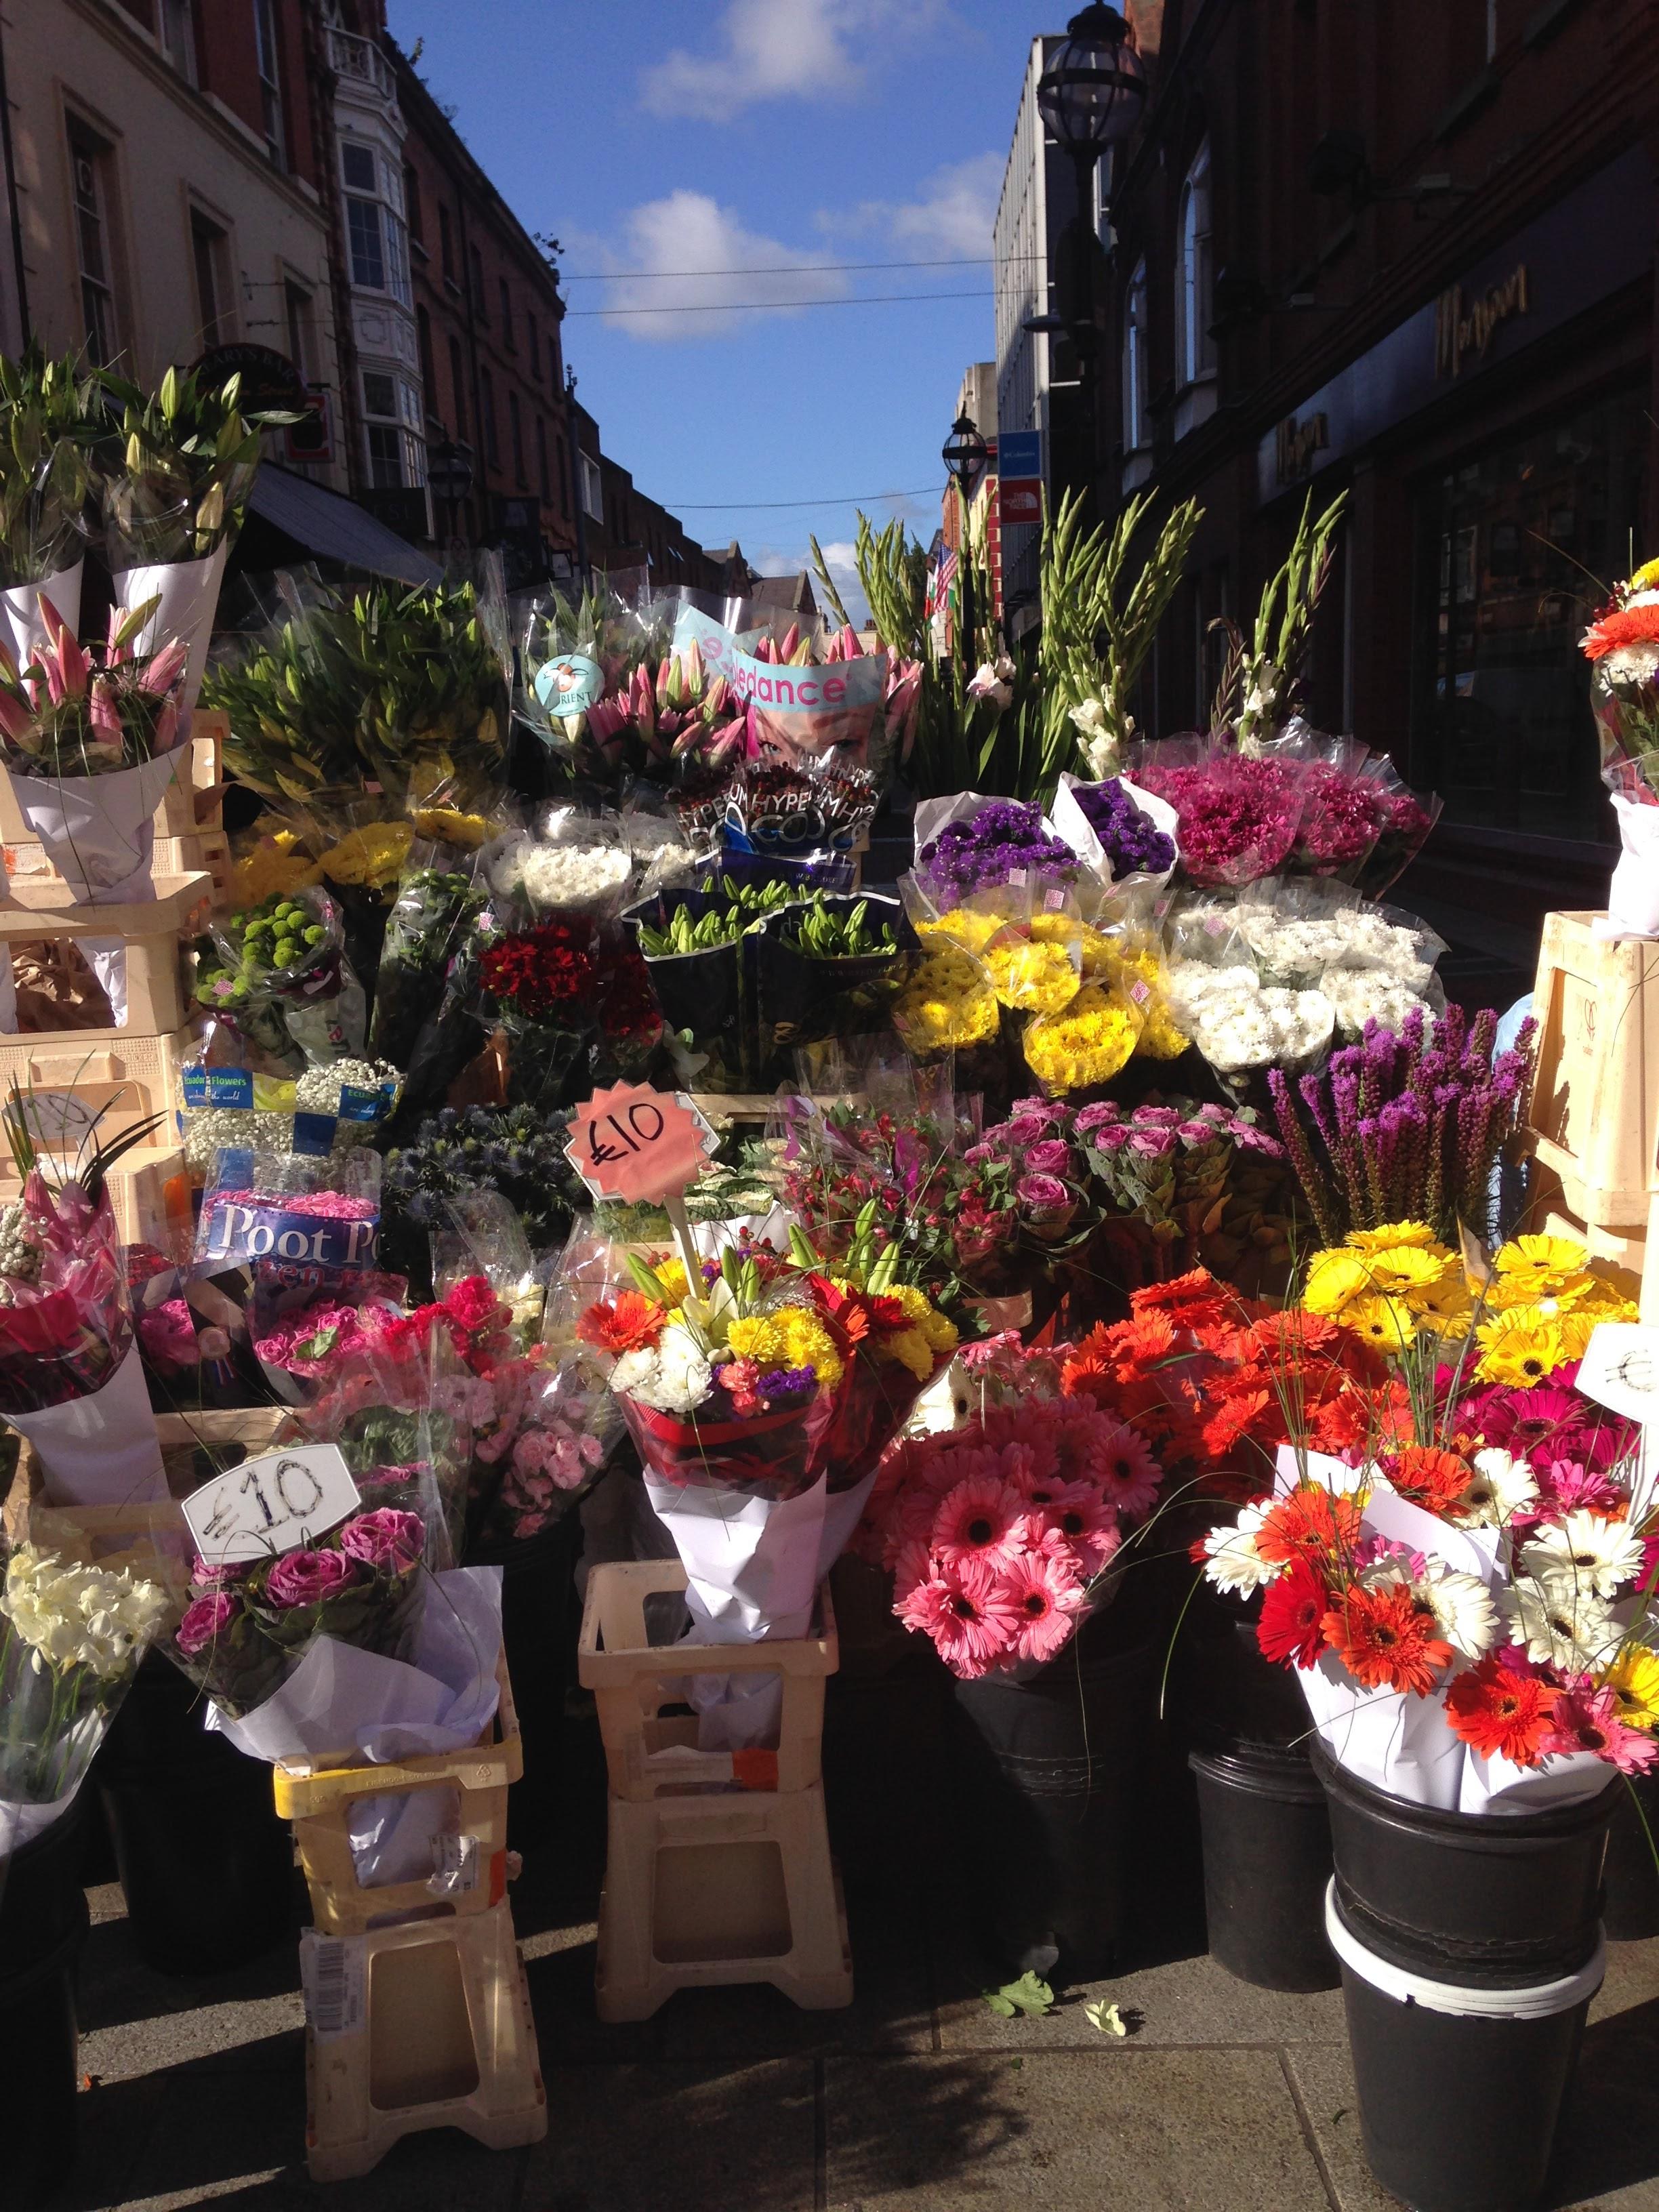 Colour Glorious Colour on Grafton St today! Love love love! xxxx